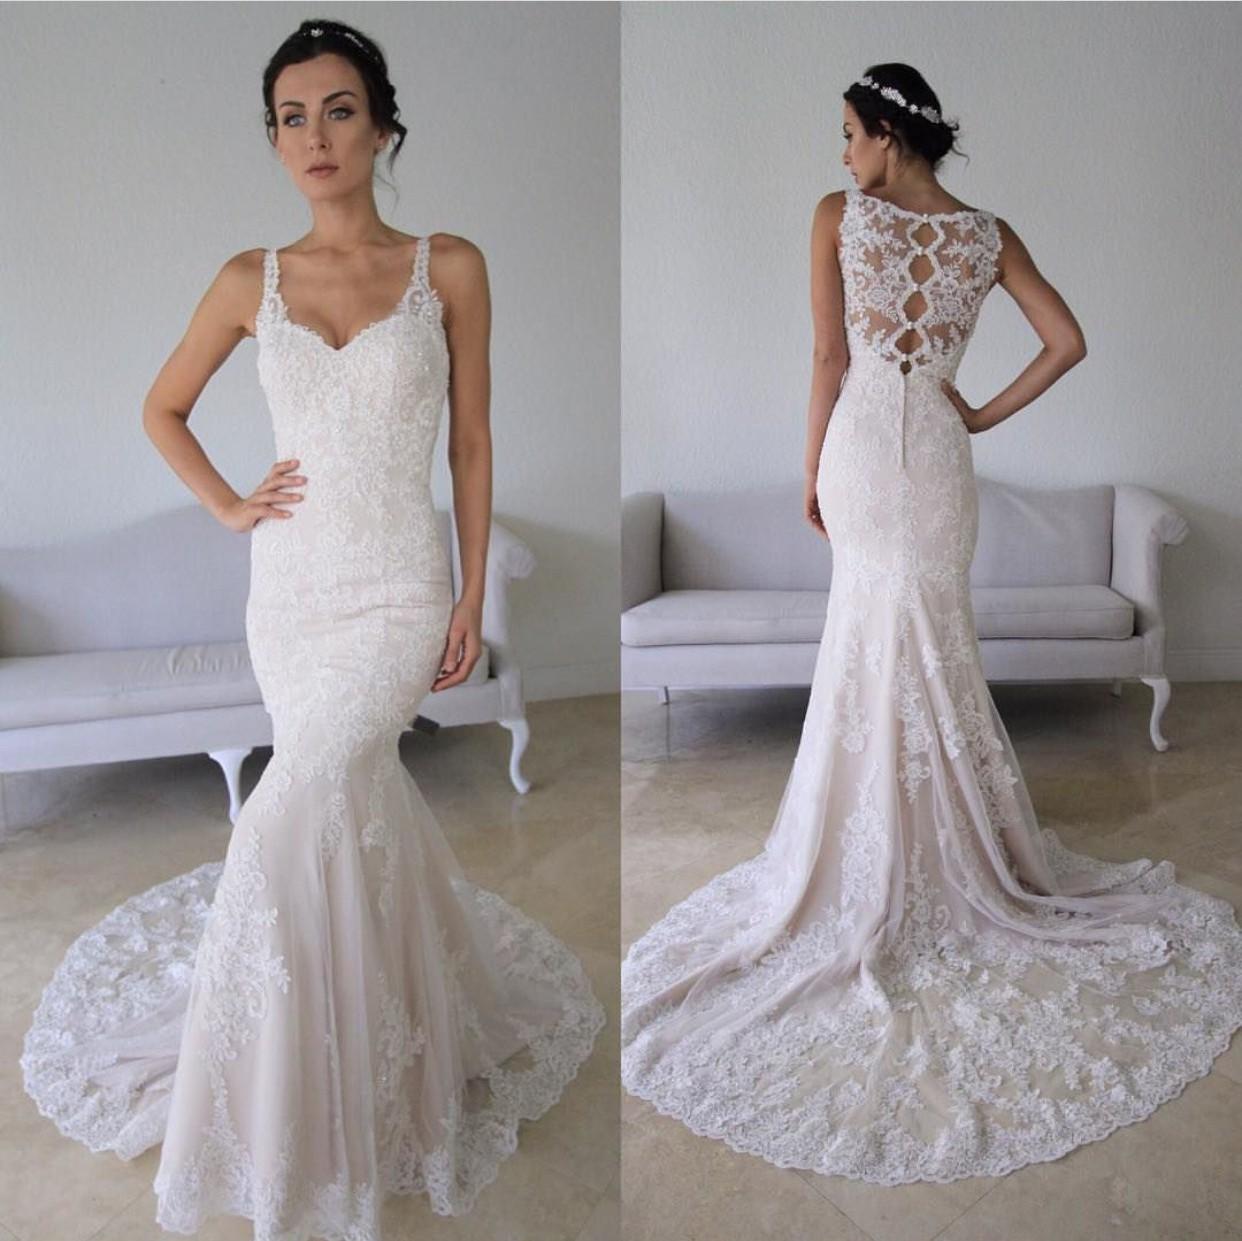 Stella York 6343 Sample Wedding Dress On Sale 54% Off